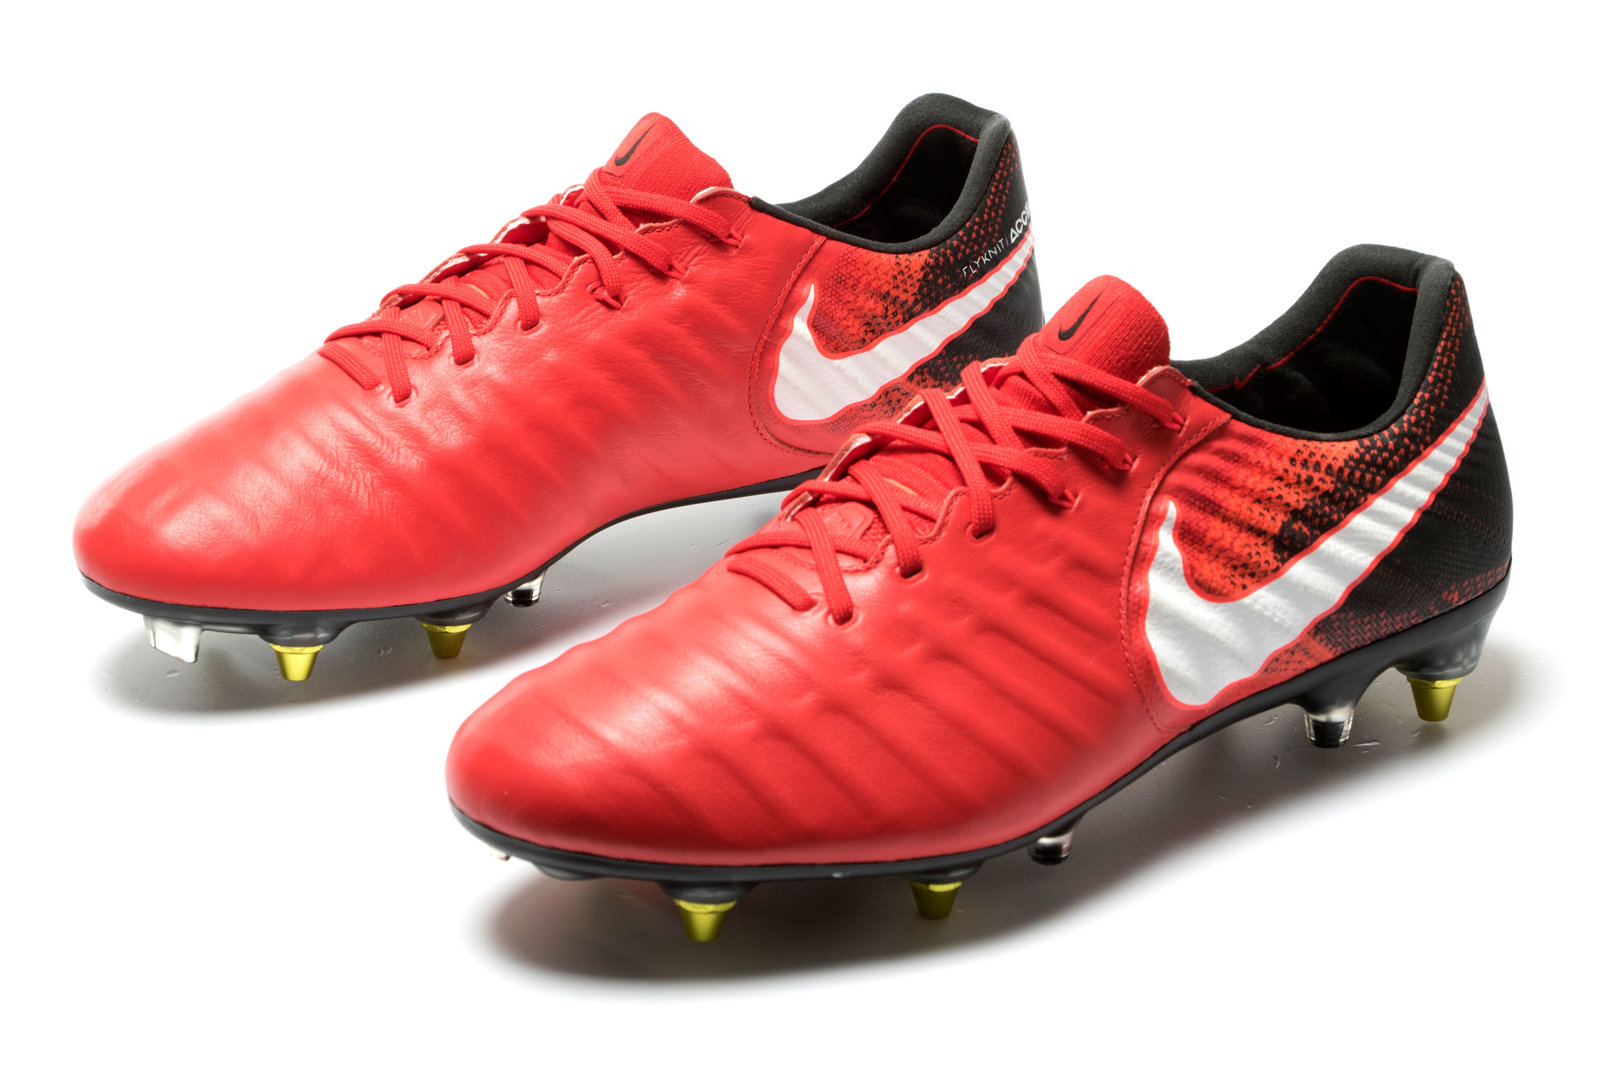 47eebd2948d Nike Mens Tiempo Legend VII Anti-Clog SG Pro Football Boots